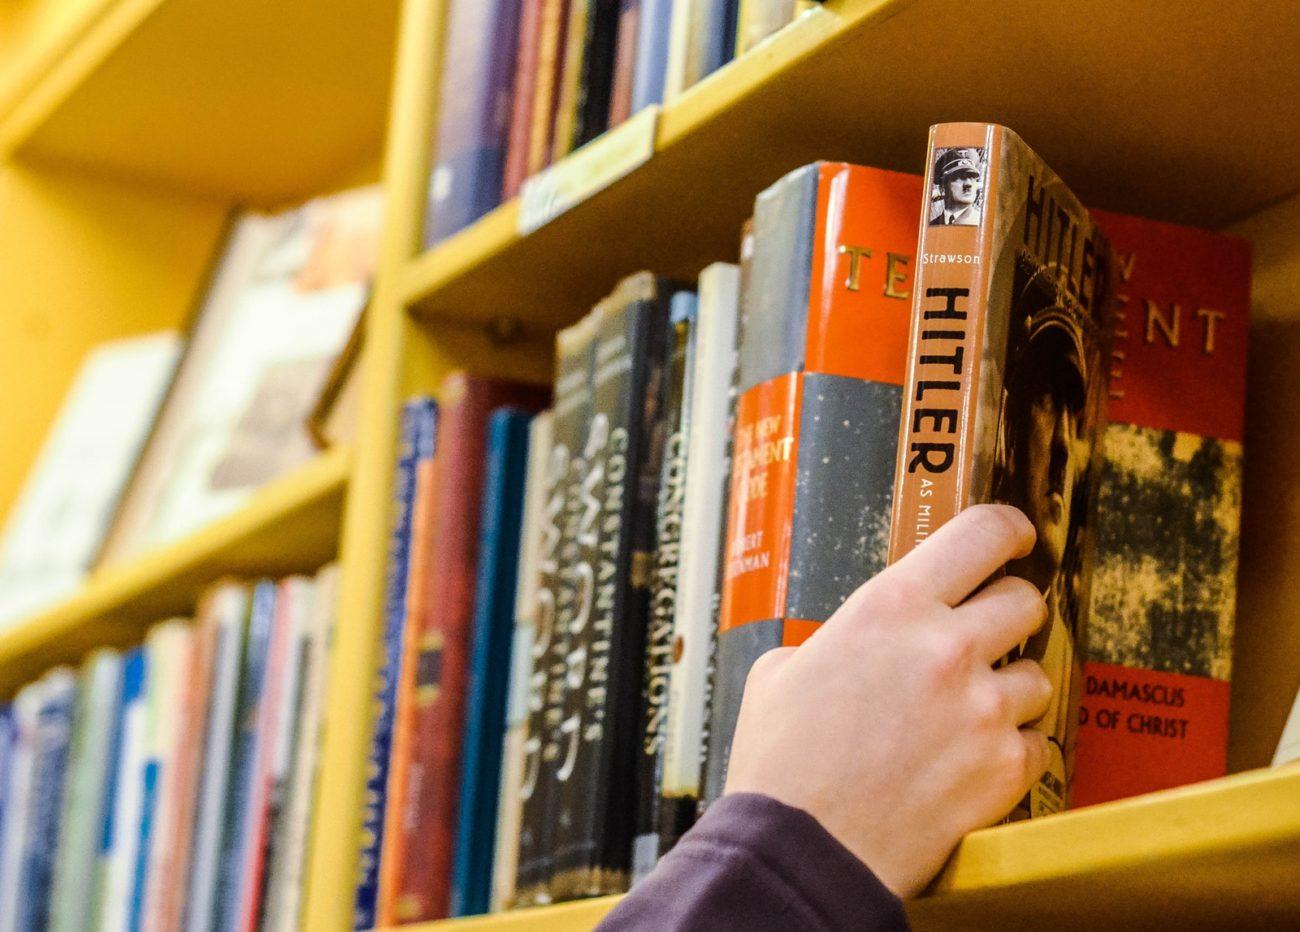 person holding book in book shelf